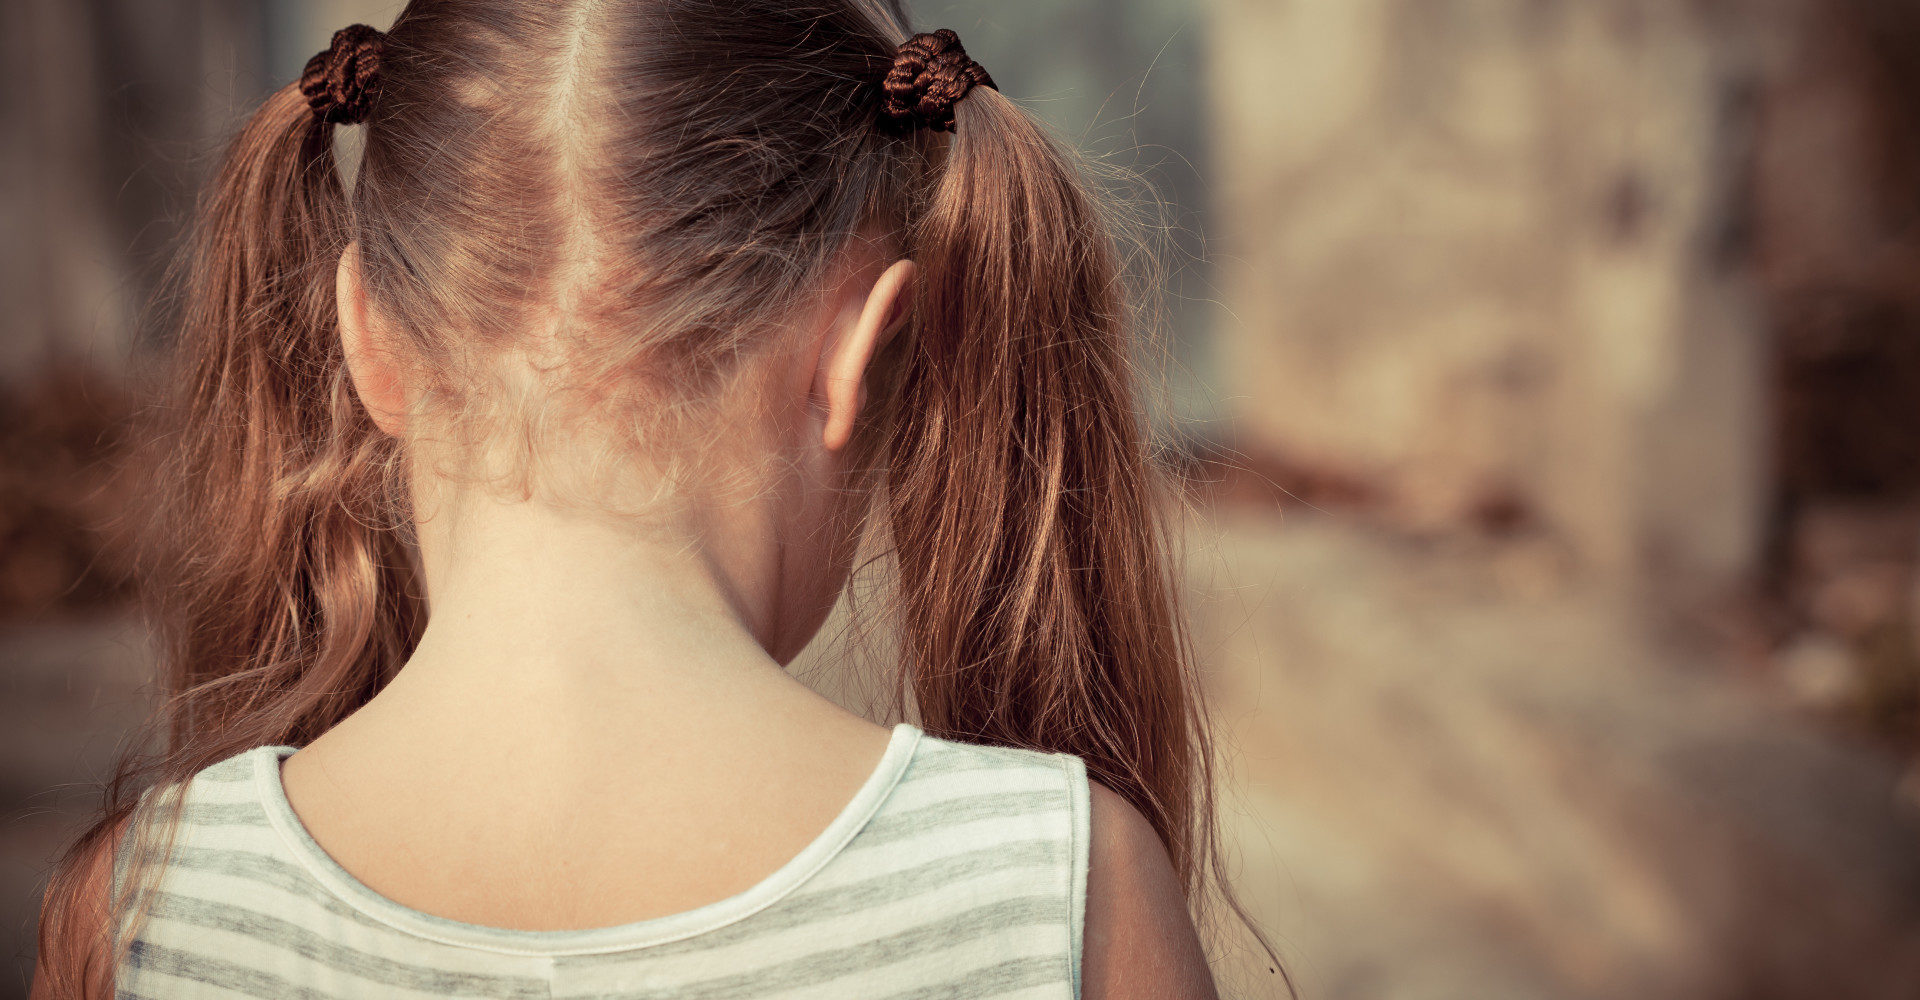 o-child-abuse-facebook